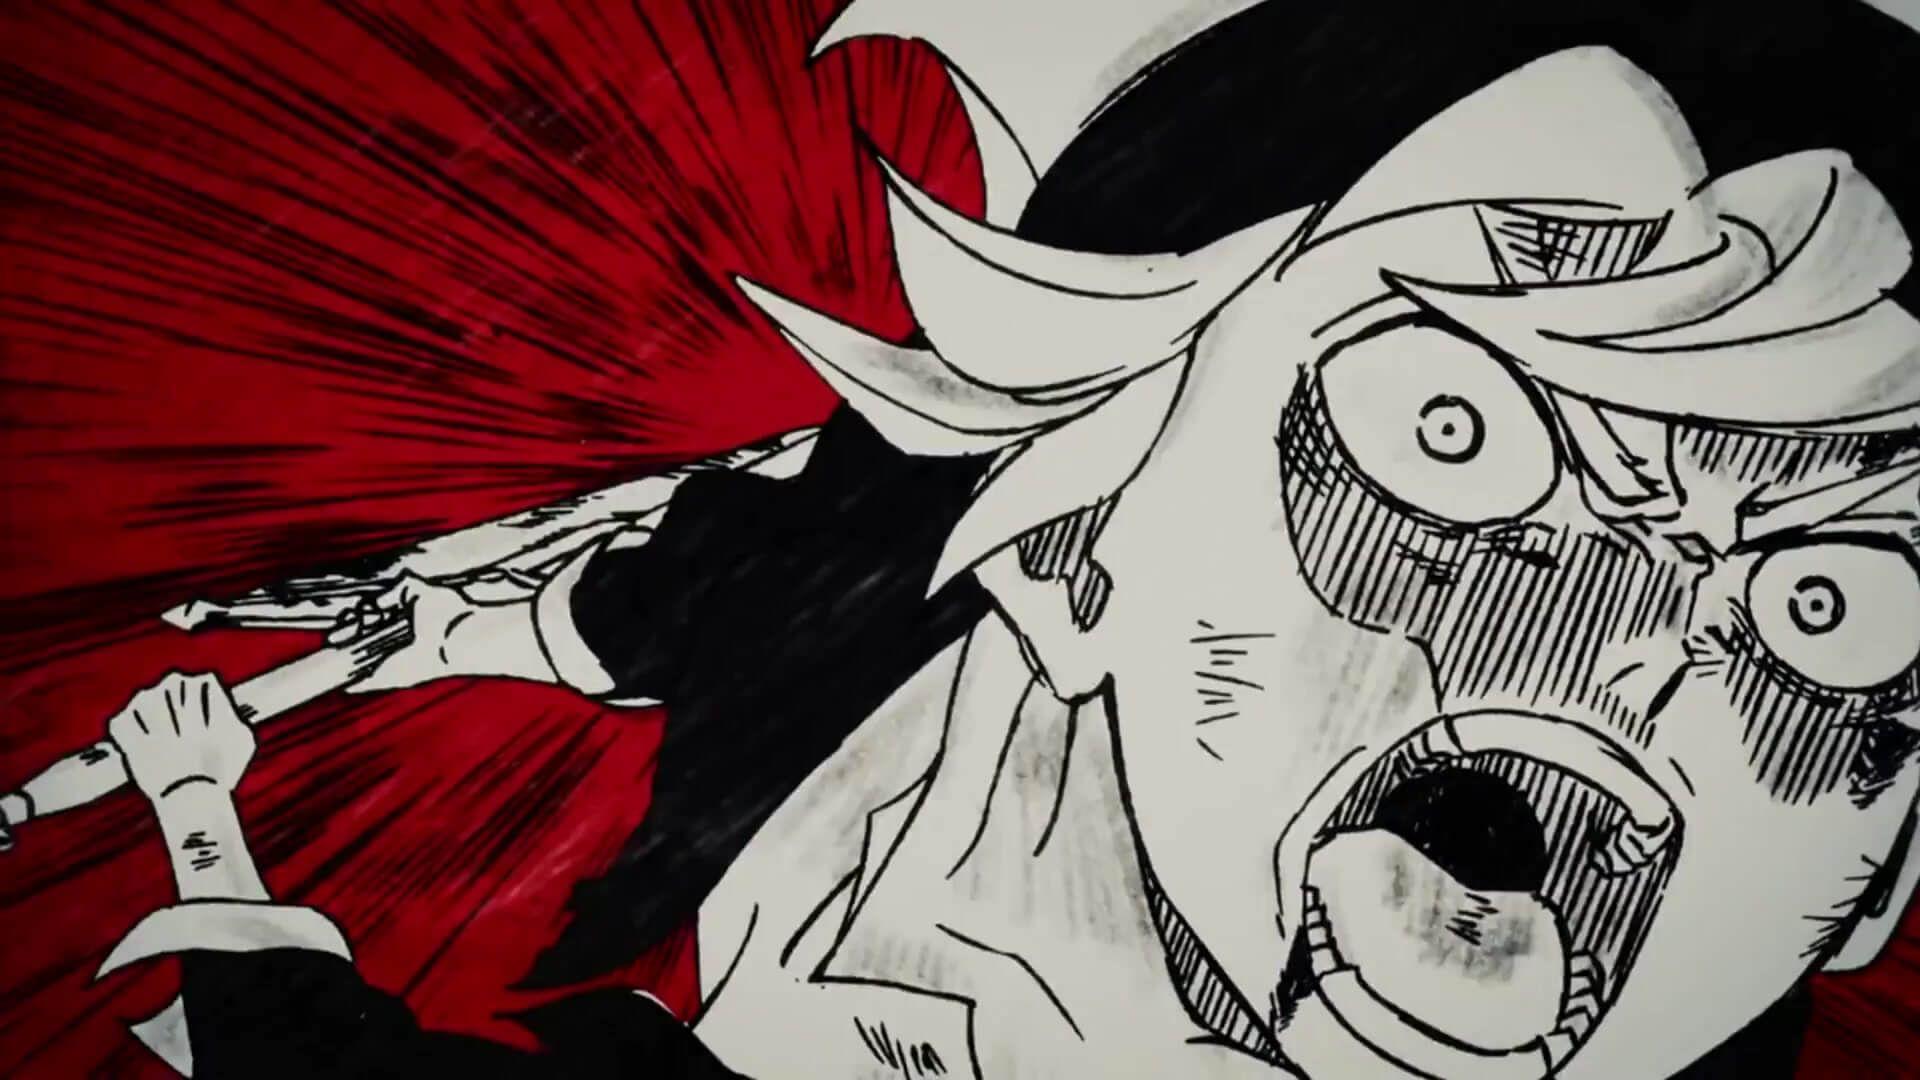 Black Clover Animated Wallpaper en 2020 Personnages